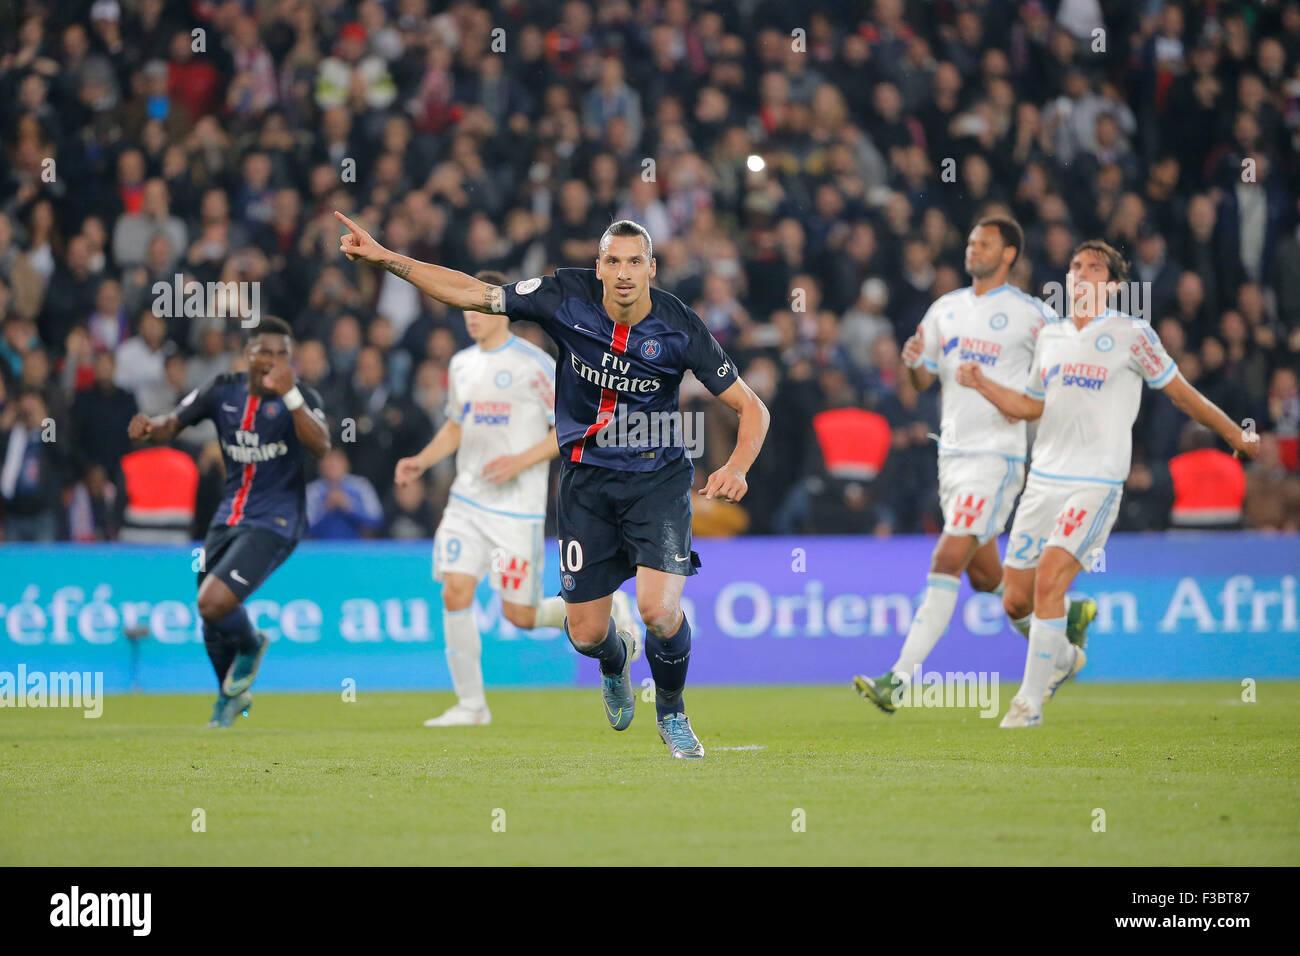 Paris, France. 04th Oct, 2015. Frenh League 1 football. Paris St German versus Olympique Marseille. Zlatan Ibrahimovic - Stock Image